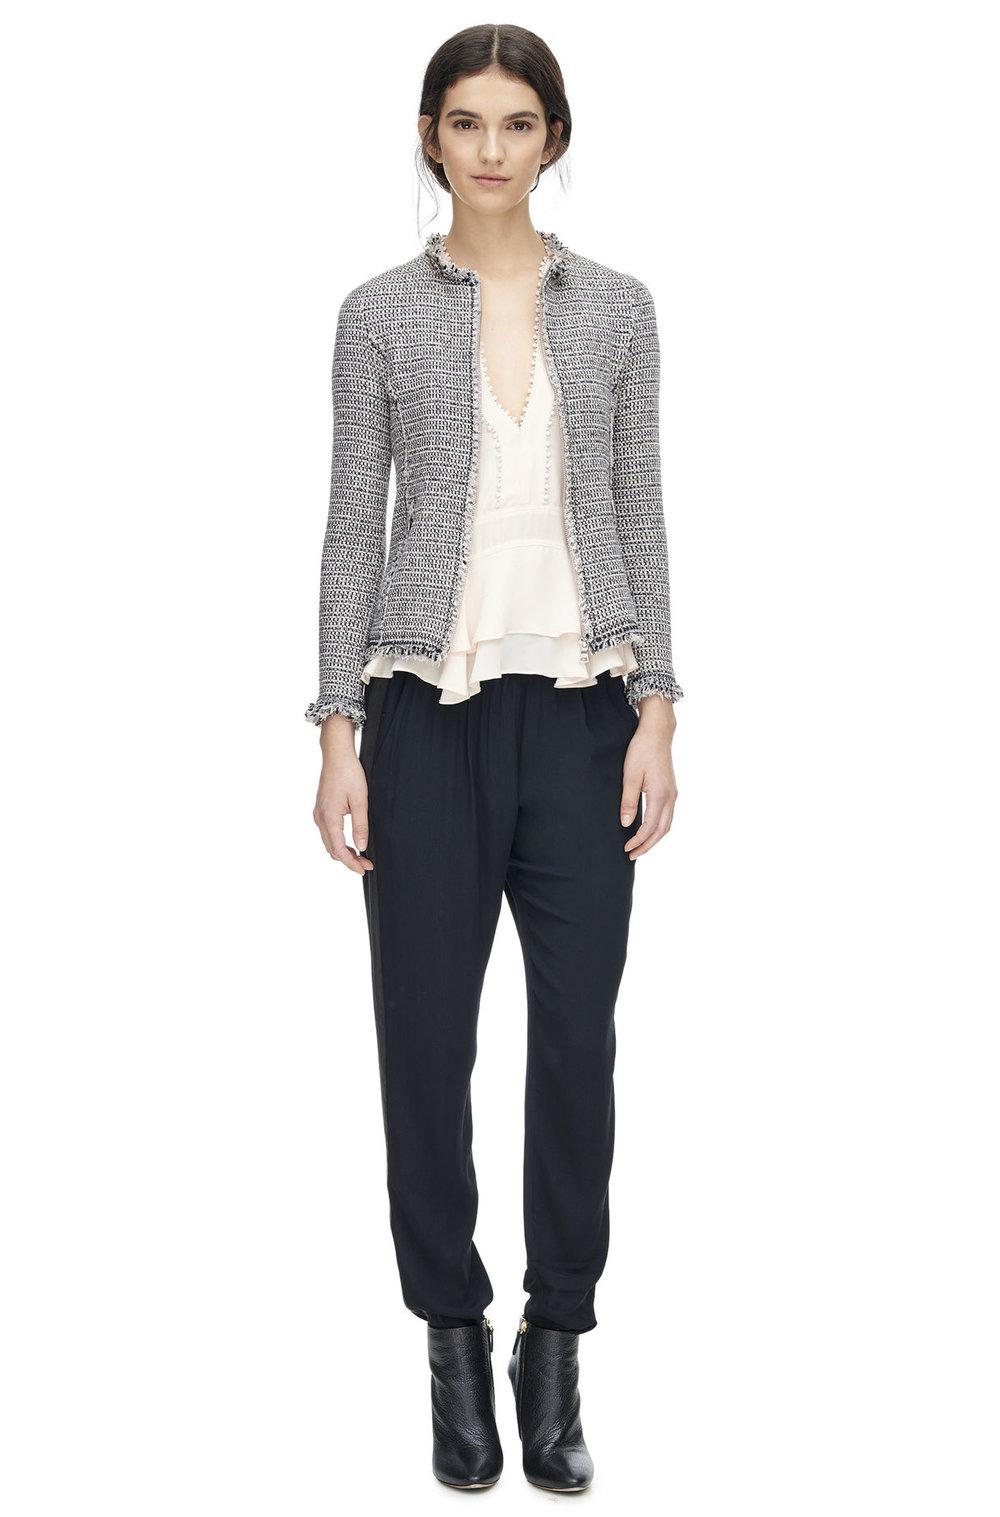 black-joggers-pants-white-top-blouse-brun-black-shoe-booties-grayl-jacket-lady-fall-winter-lunch.jpg